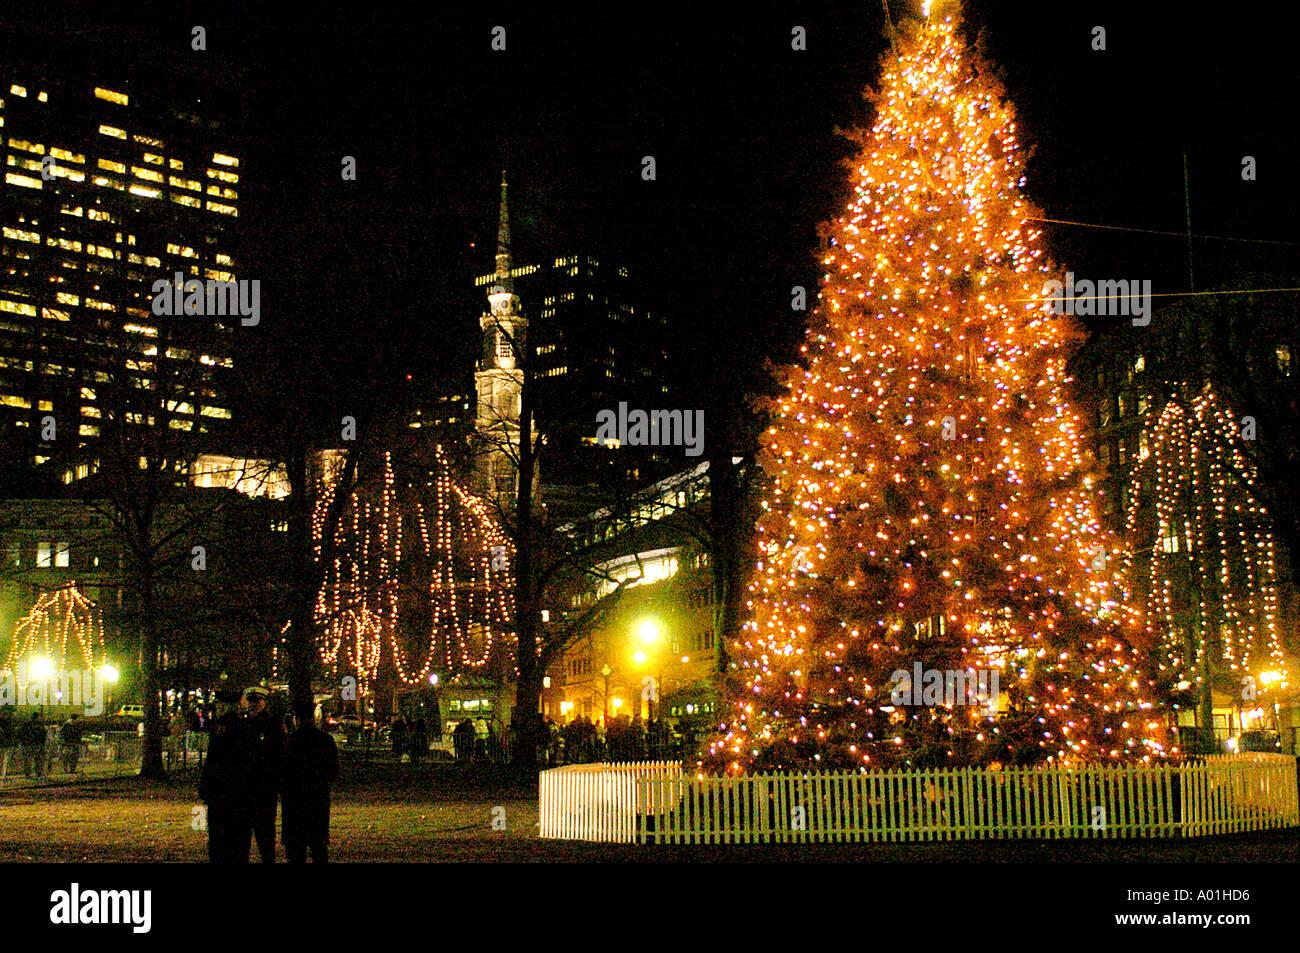 Christmas Tree Lights Boston Common Stock Photo Royalty Free  - Boston Christmas Tree Lighting